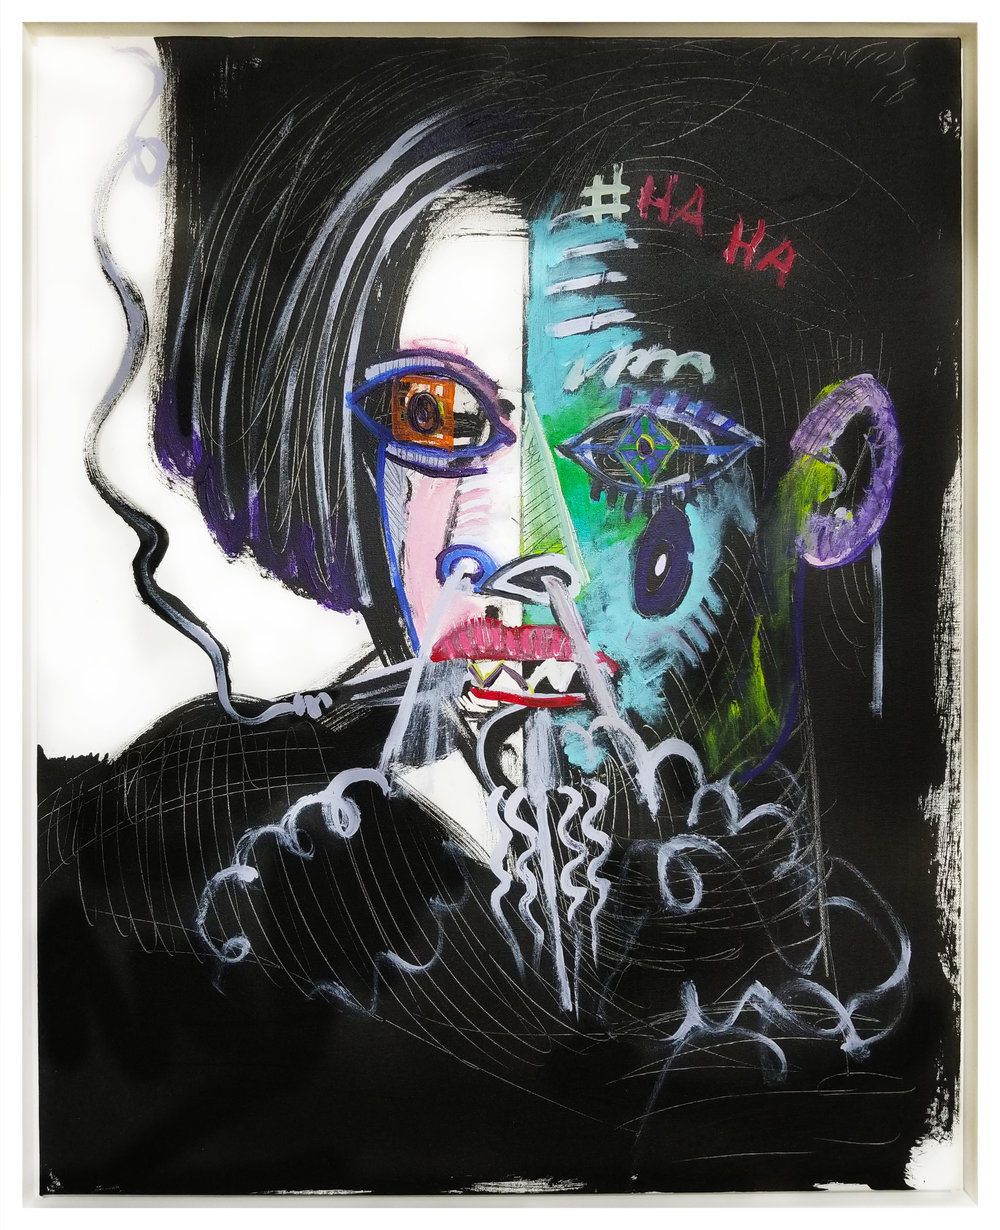 "Untitled #83, 2018, acrylic on canvas, 30"" x 24"" (76.2 x 60.96 cm)"